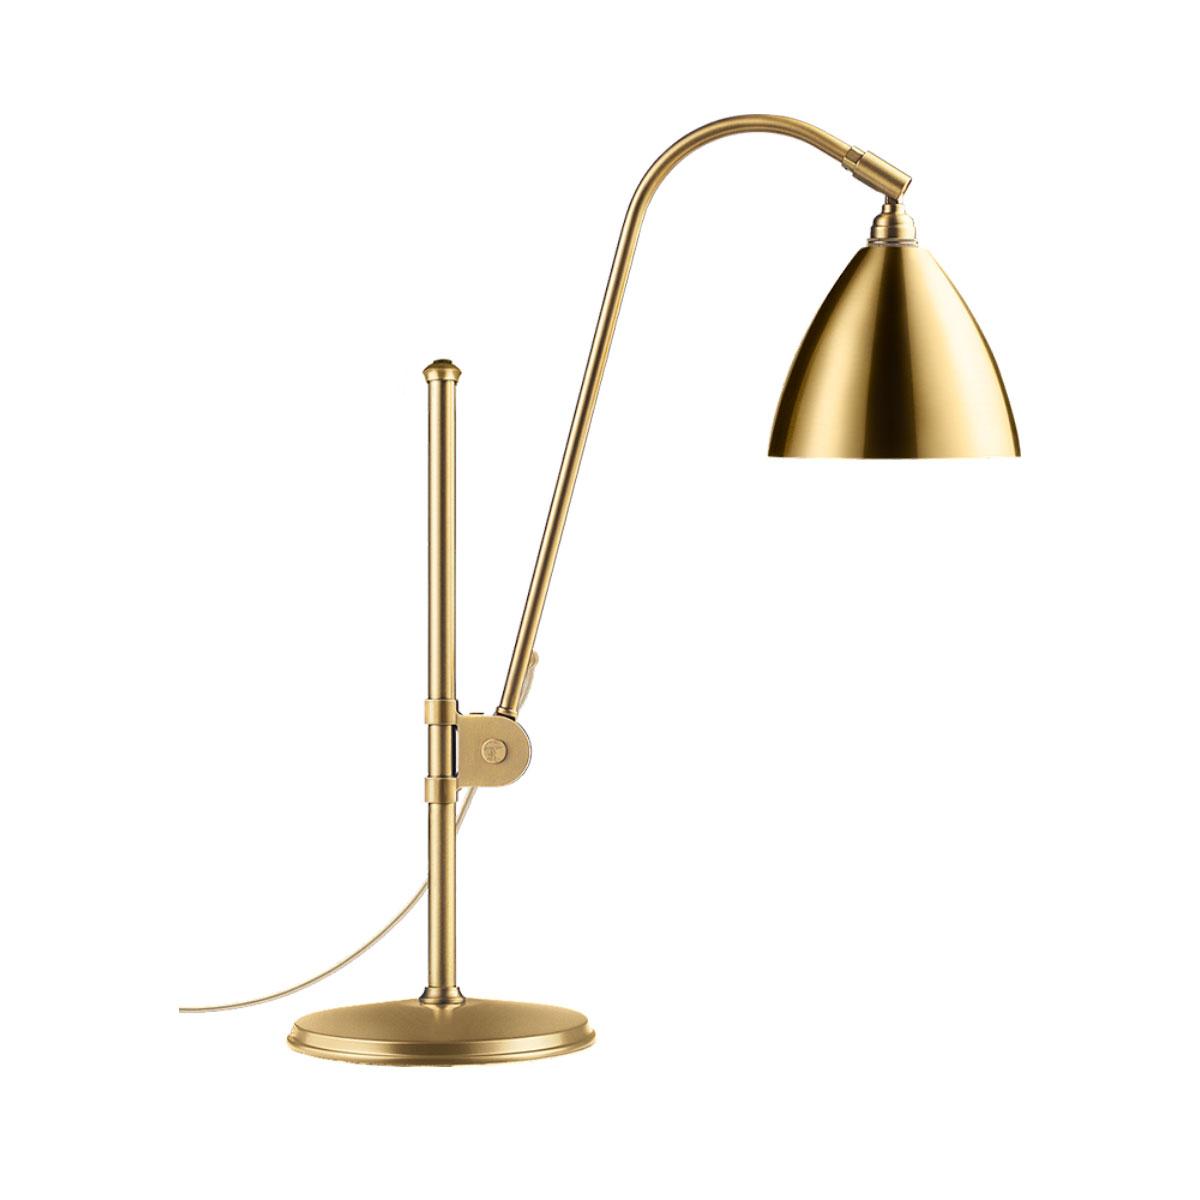 Gubi BL1 table lamp 16 shinybrass